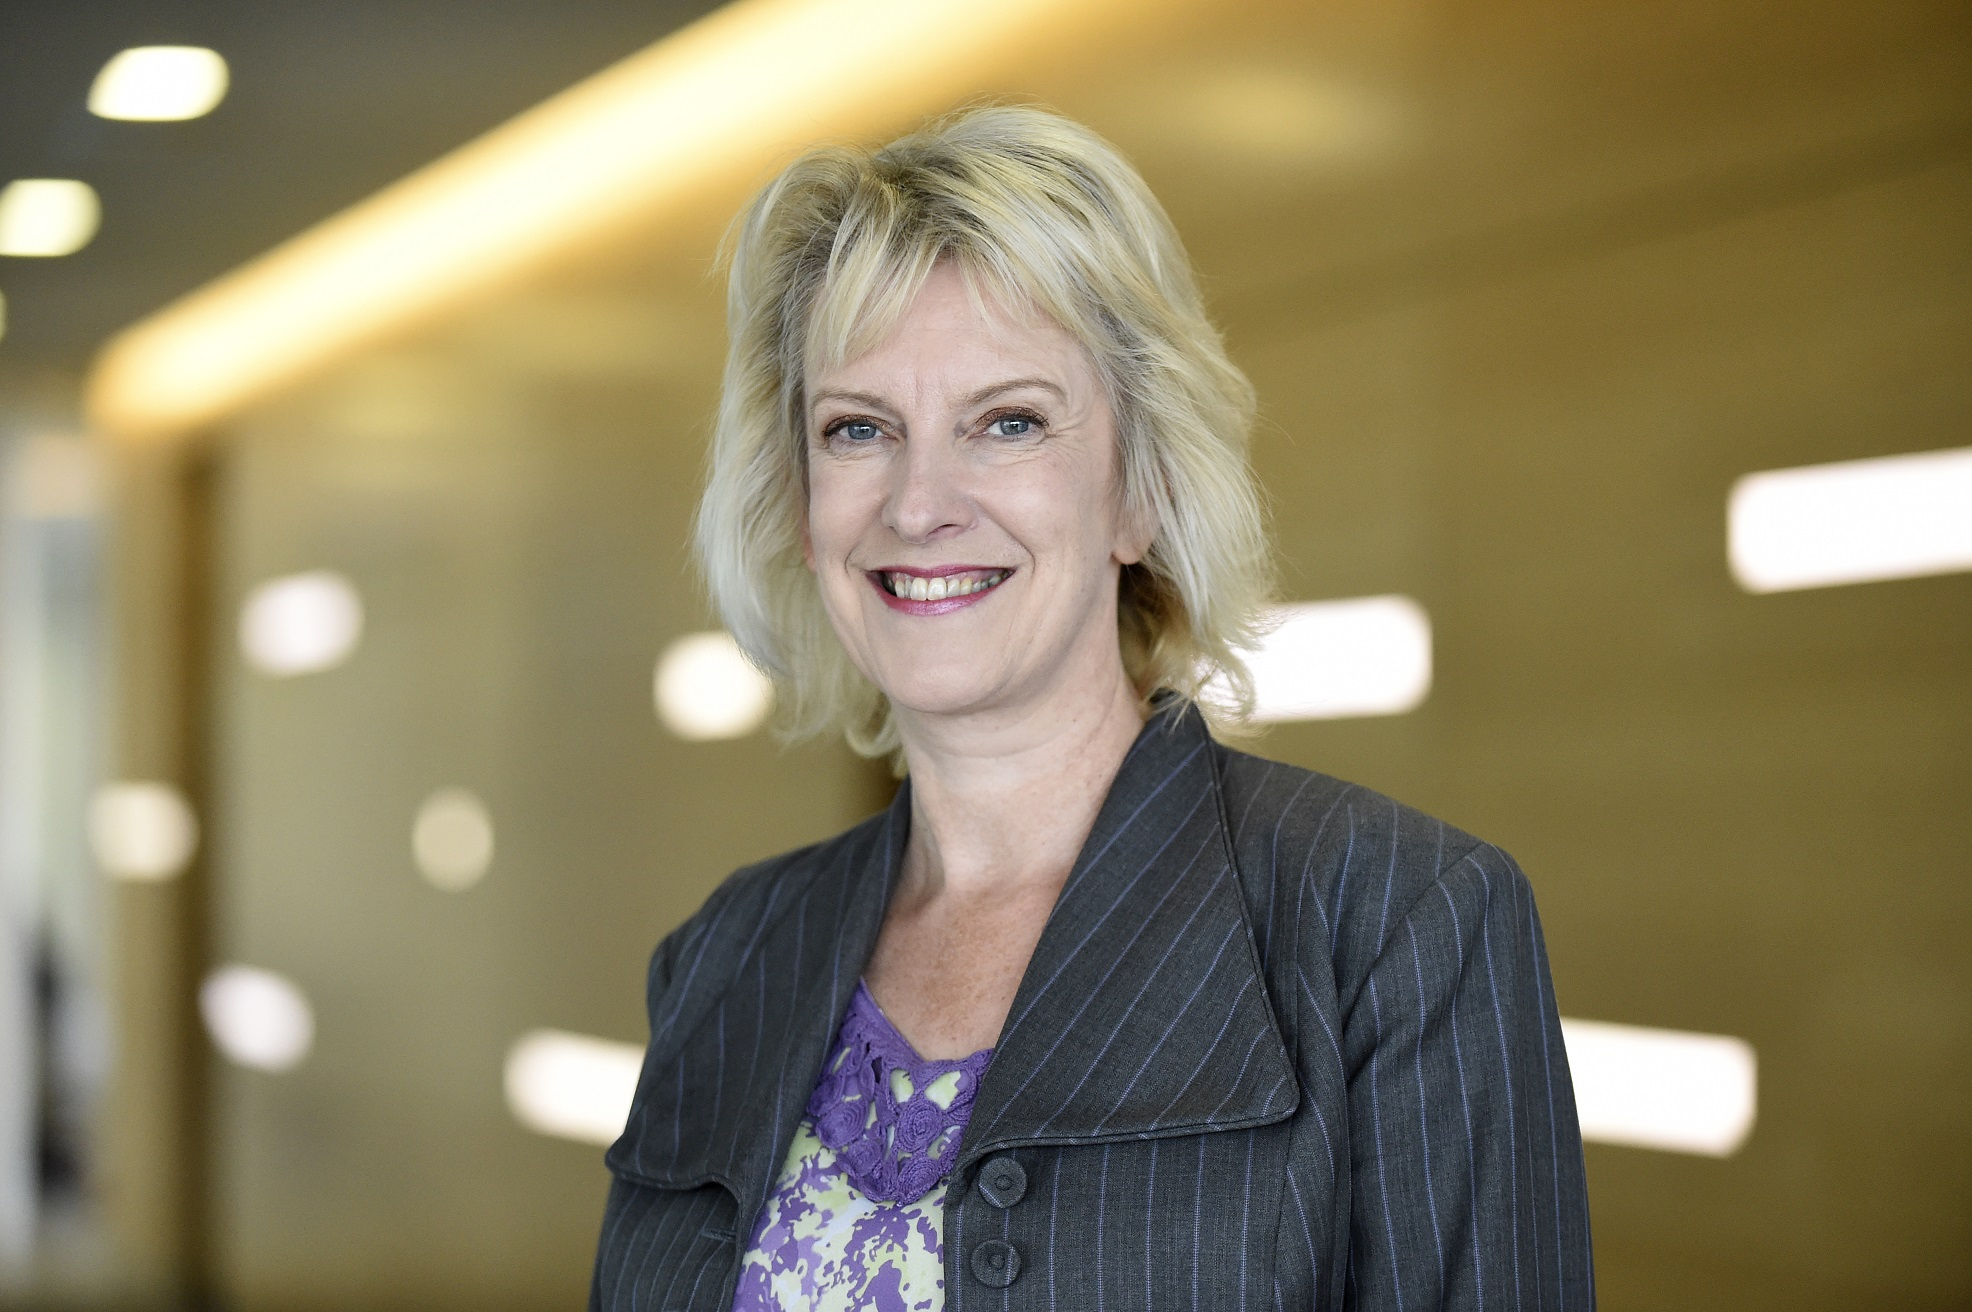 Carolyn Saunders, Head of Pensions and Long-Term Savings, Pinsent Masons LLP